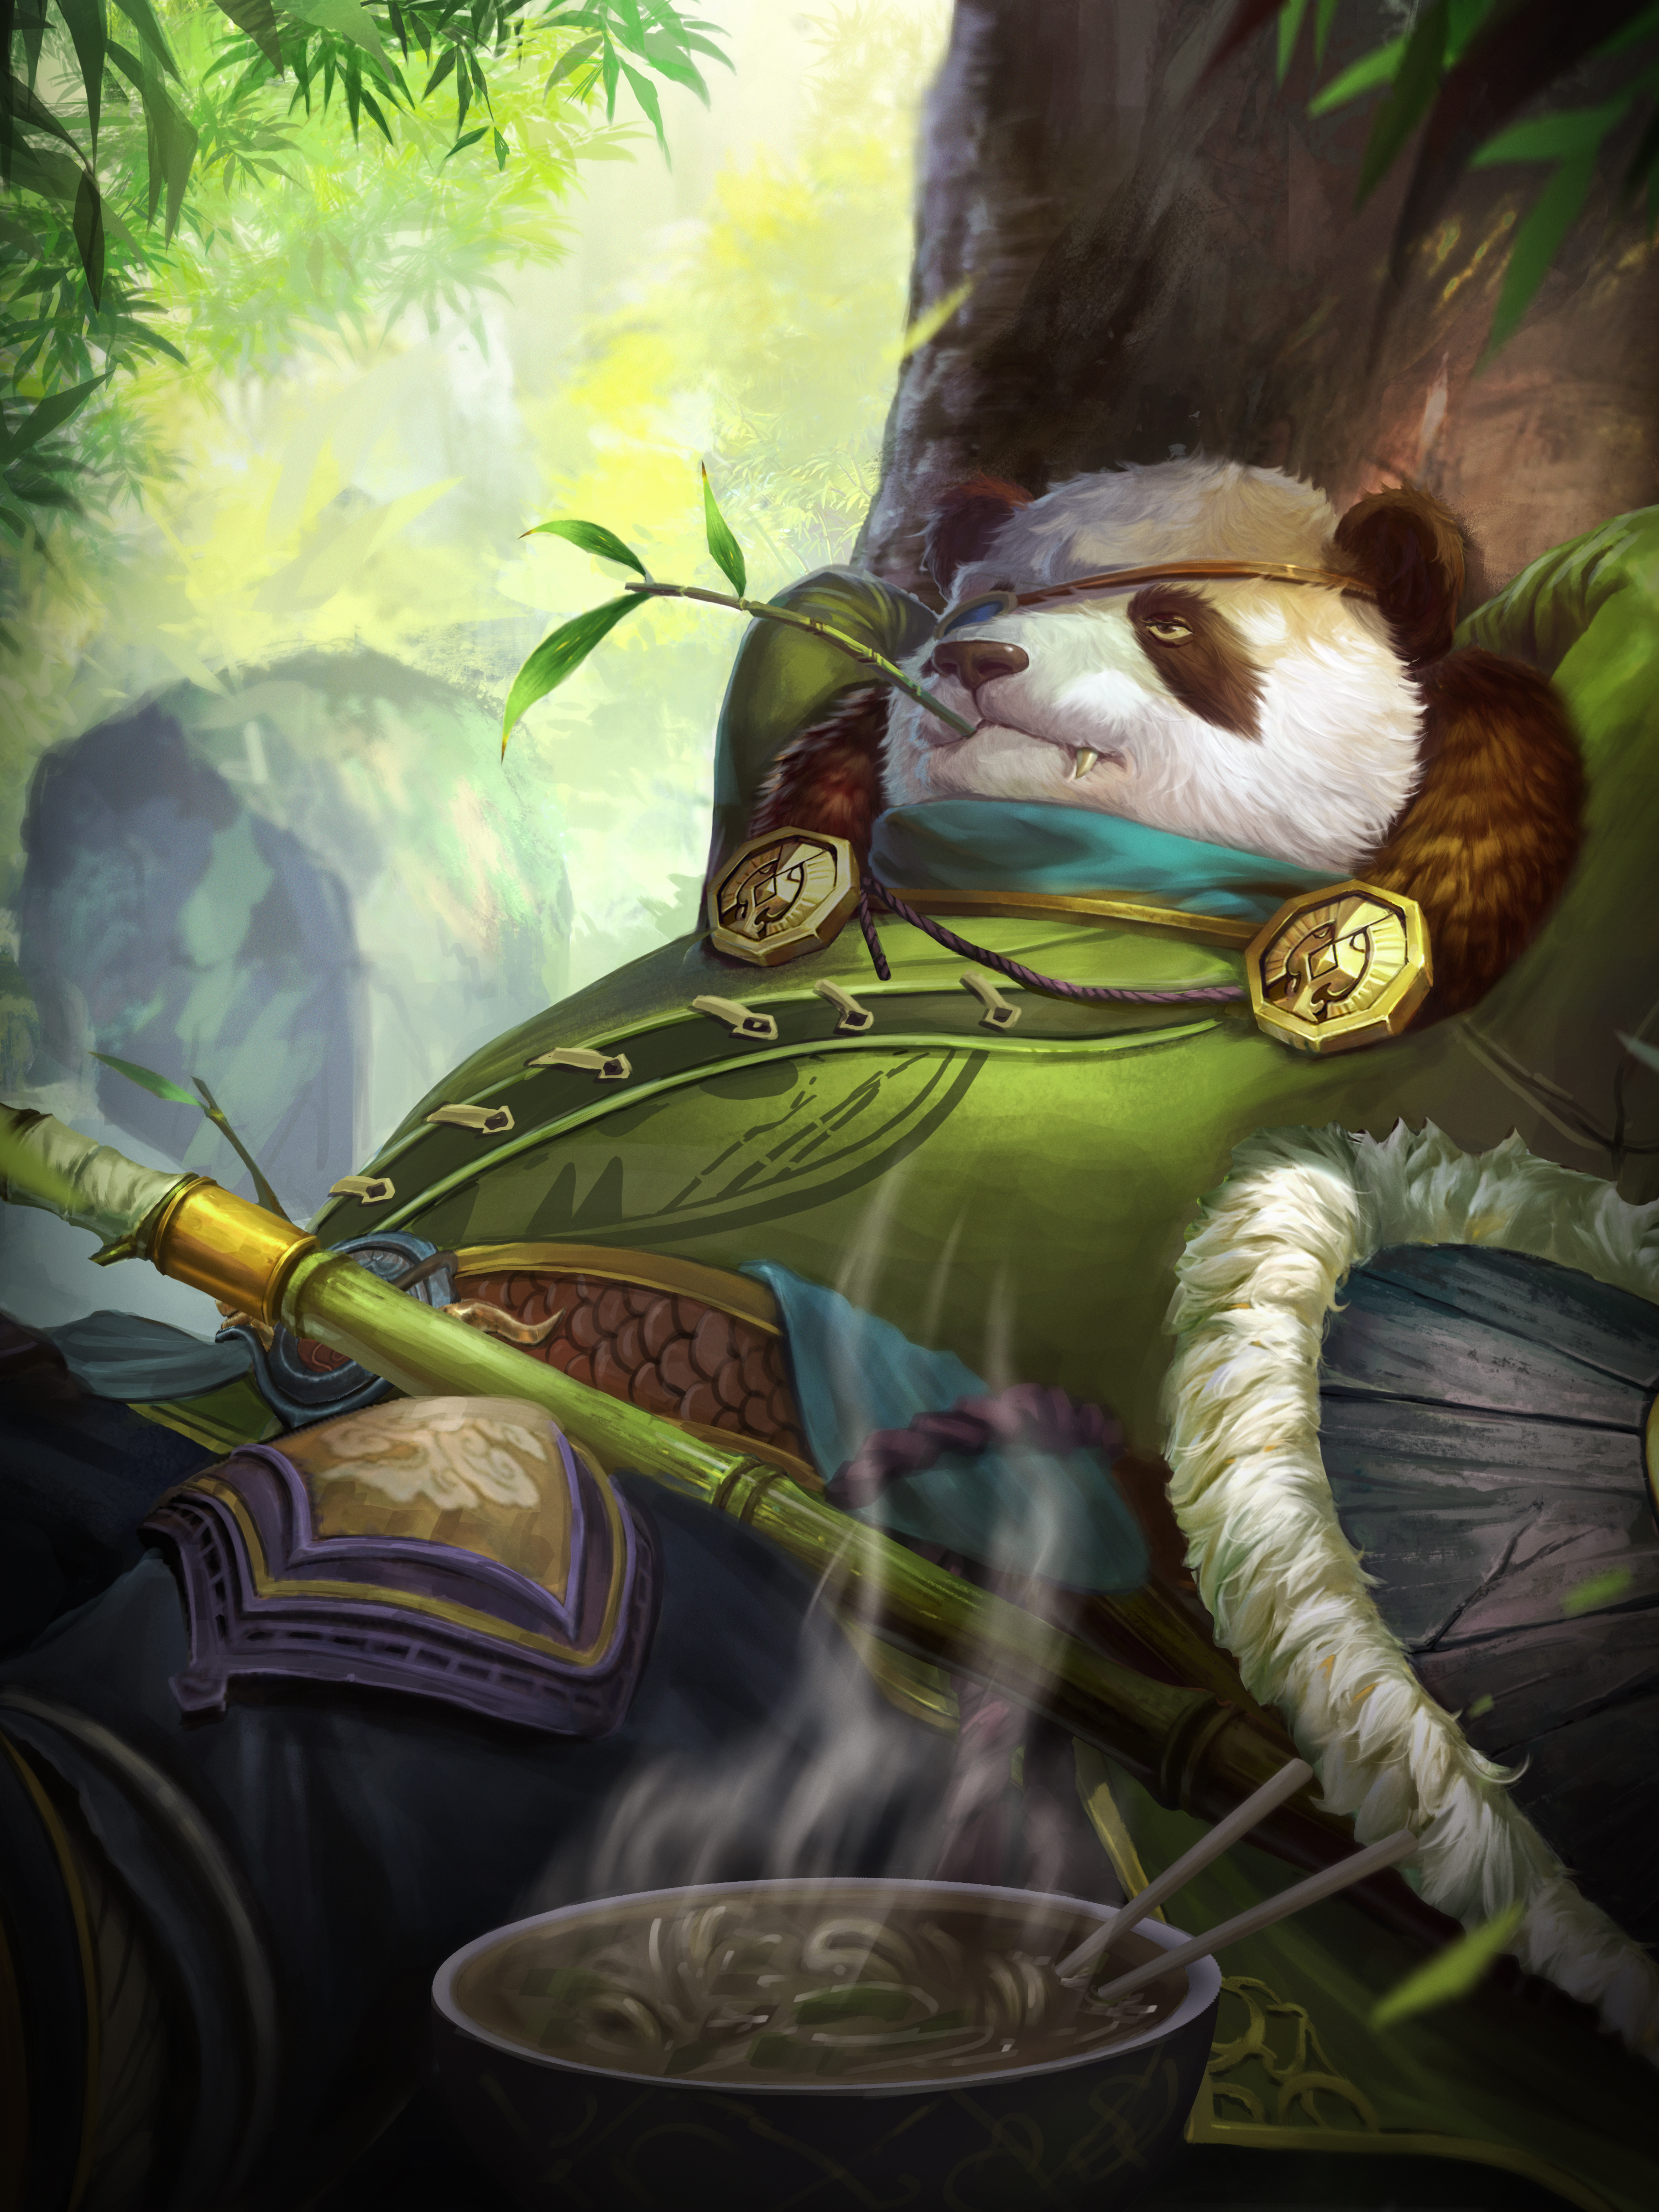 odin-panda